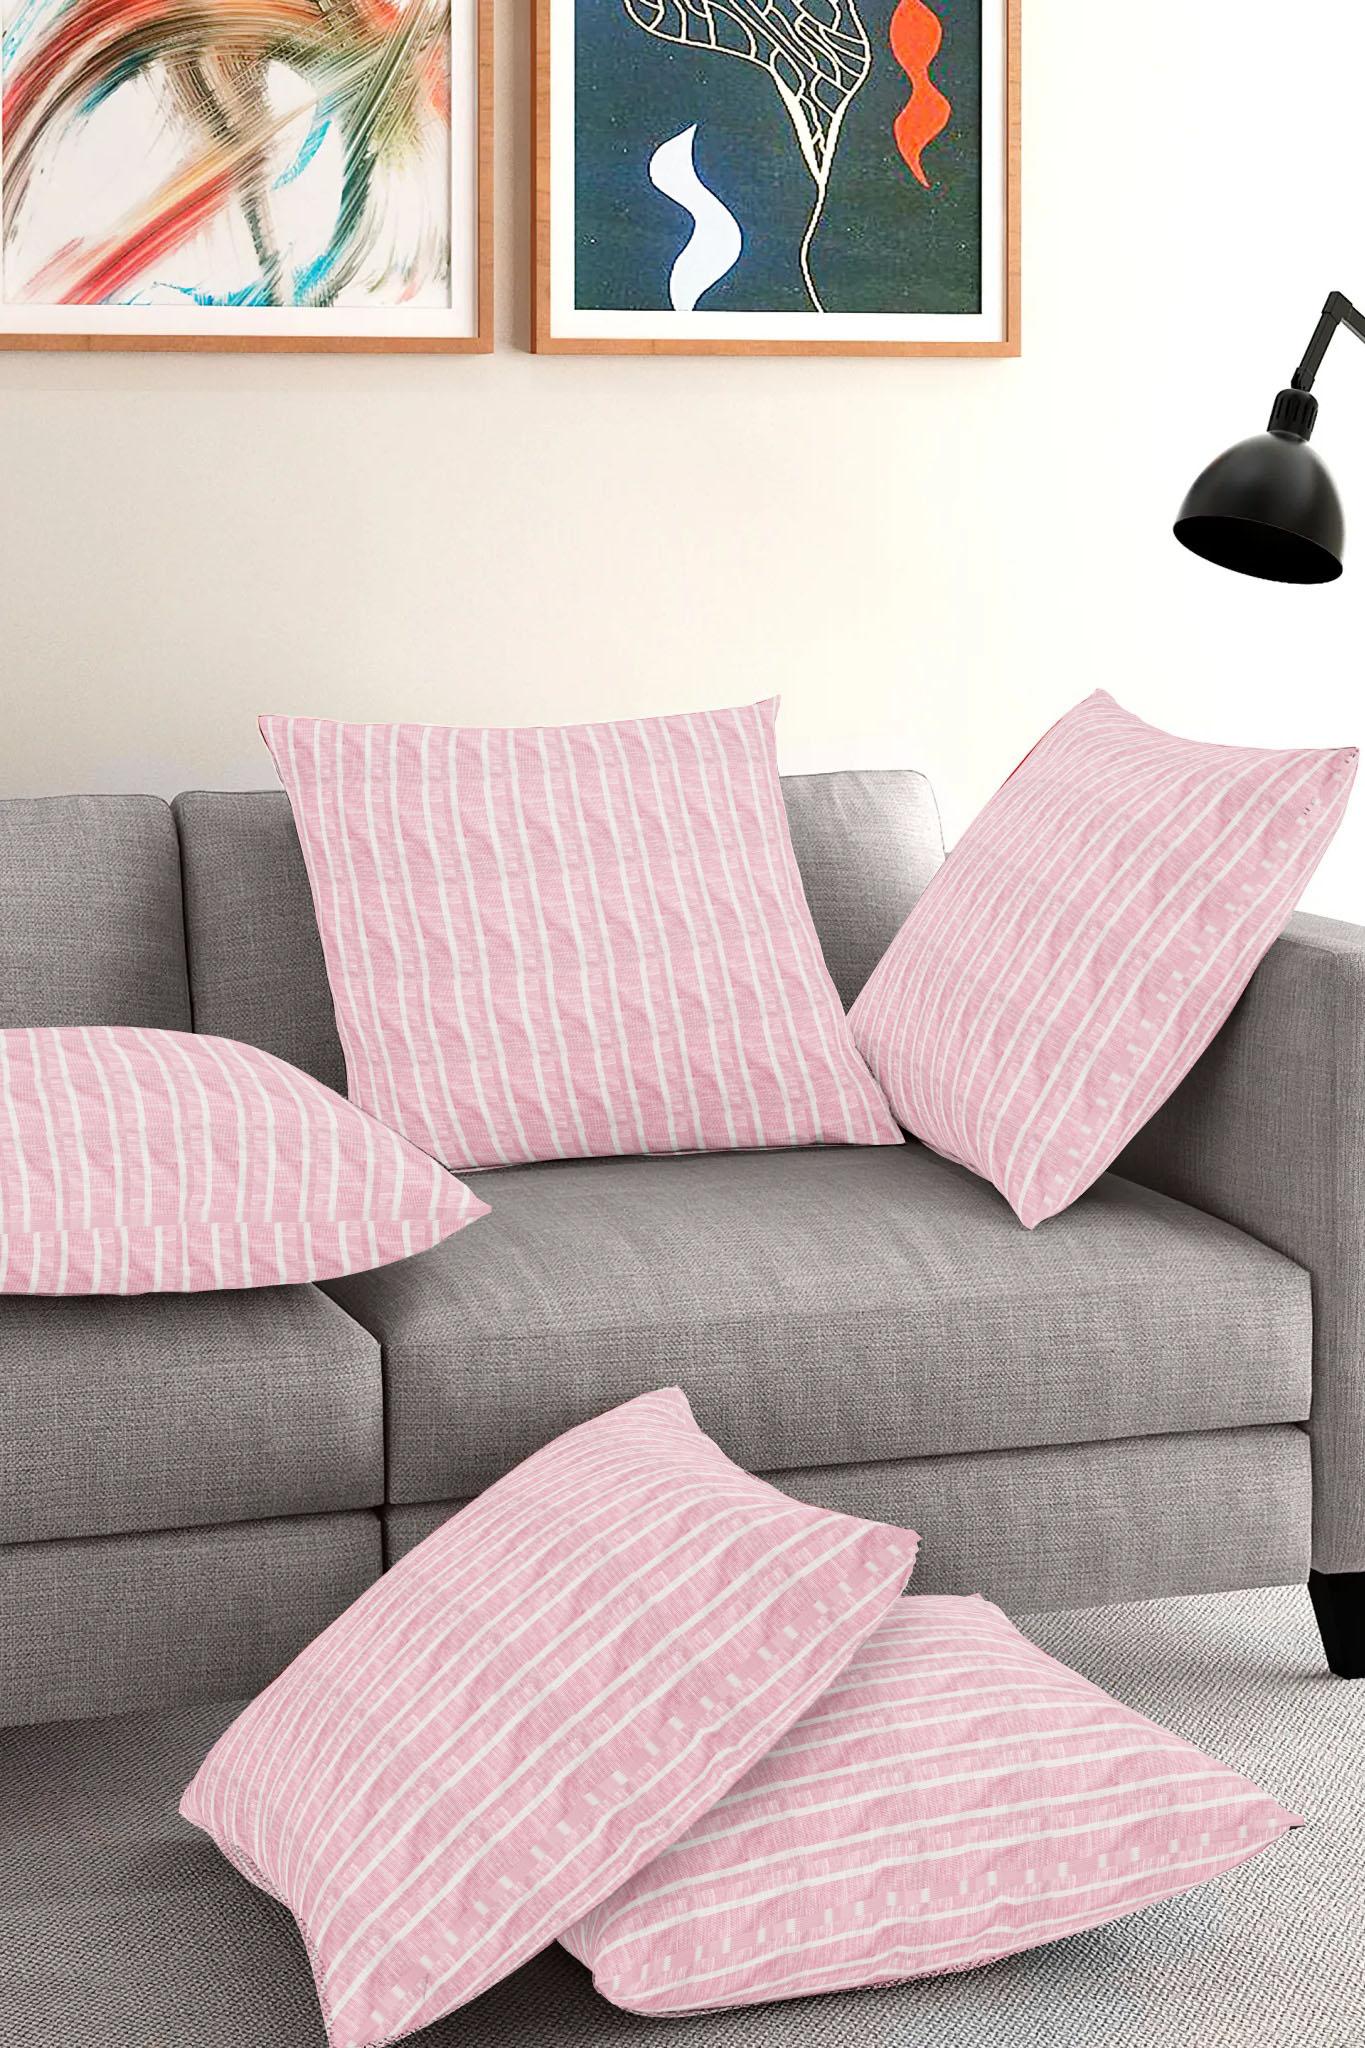 /home/customer/www/fabartcraft.com/public_html/uploadshttps://www.shopolics.com/uploads/images/medium/Pink-White-Cotton-Cushion-Cover-35383.jpg